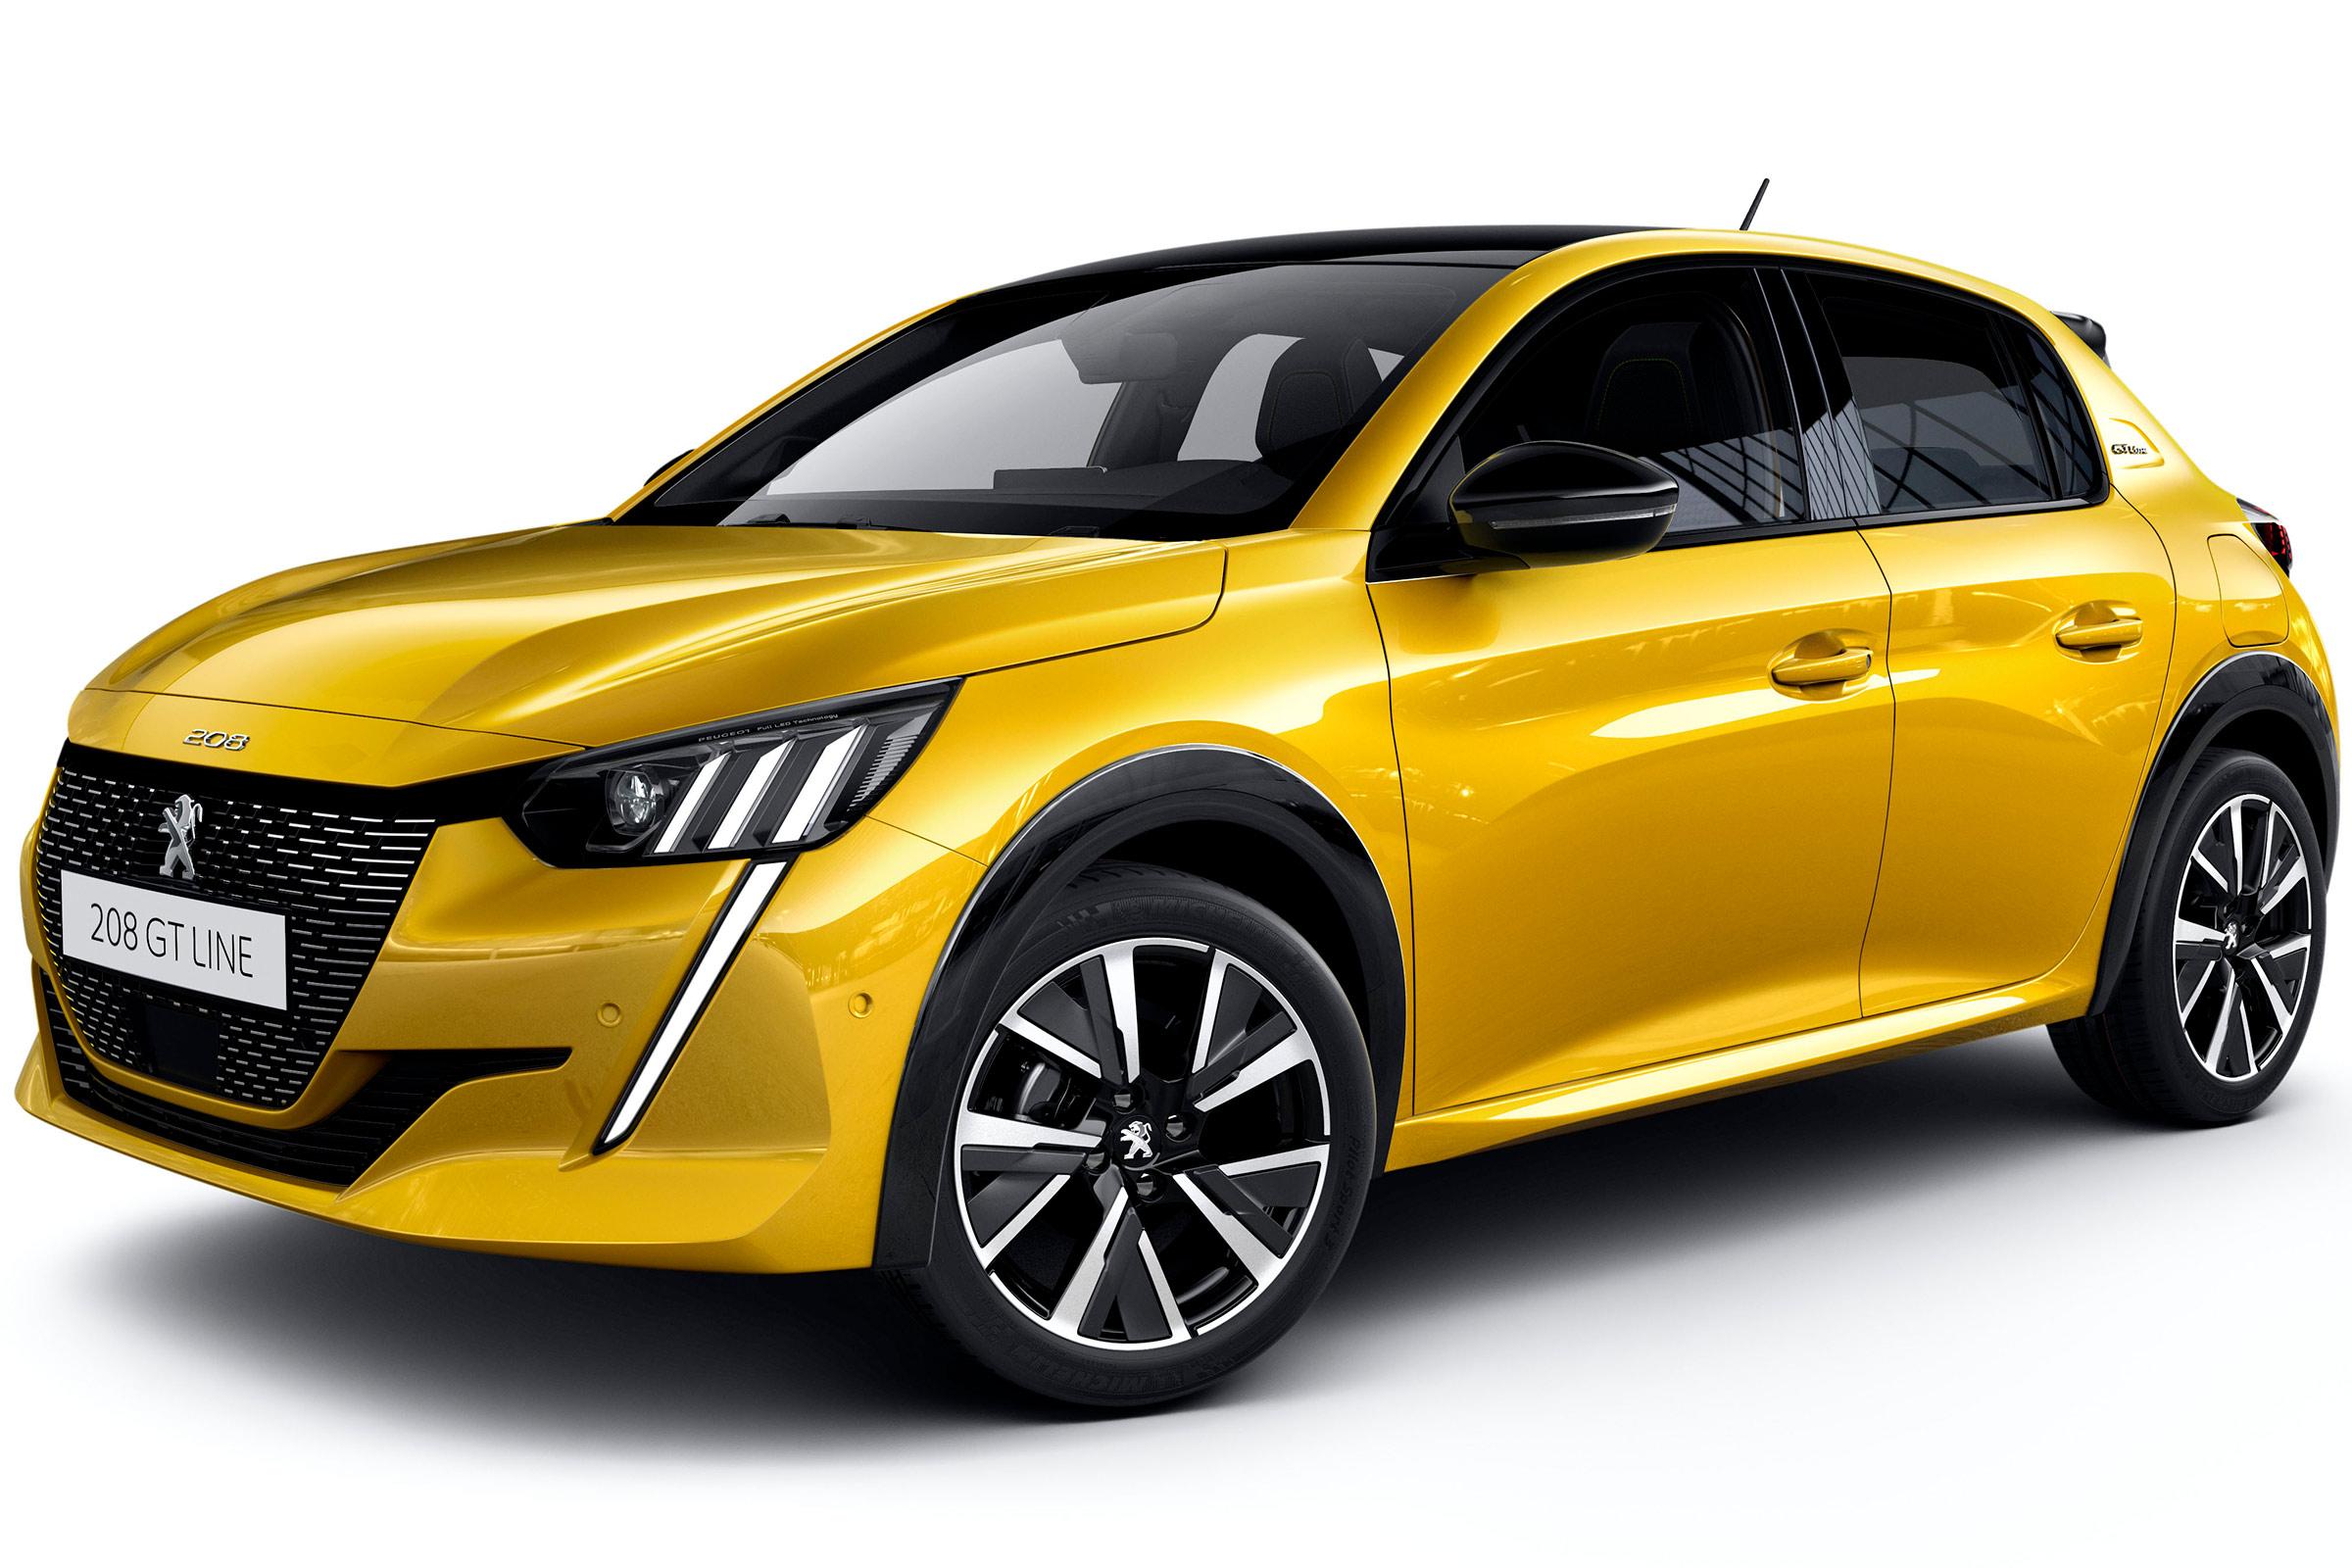 New Peugeot 208 lease